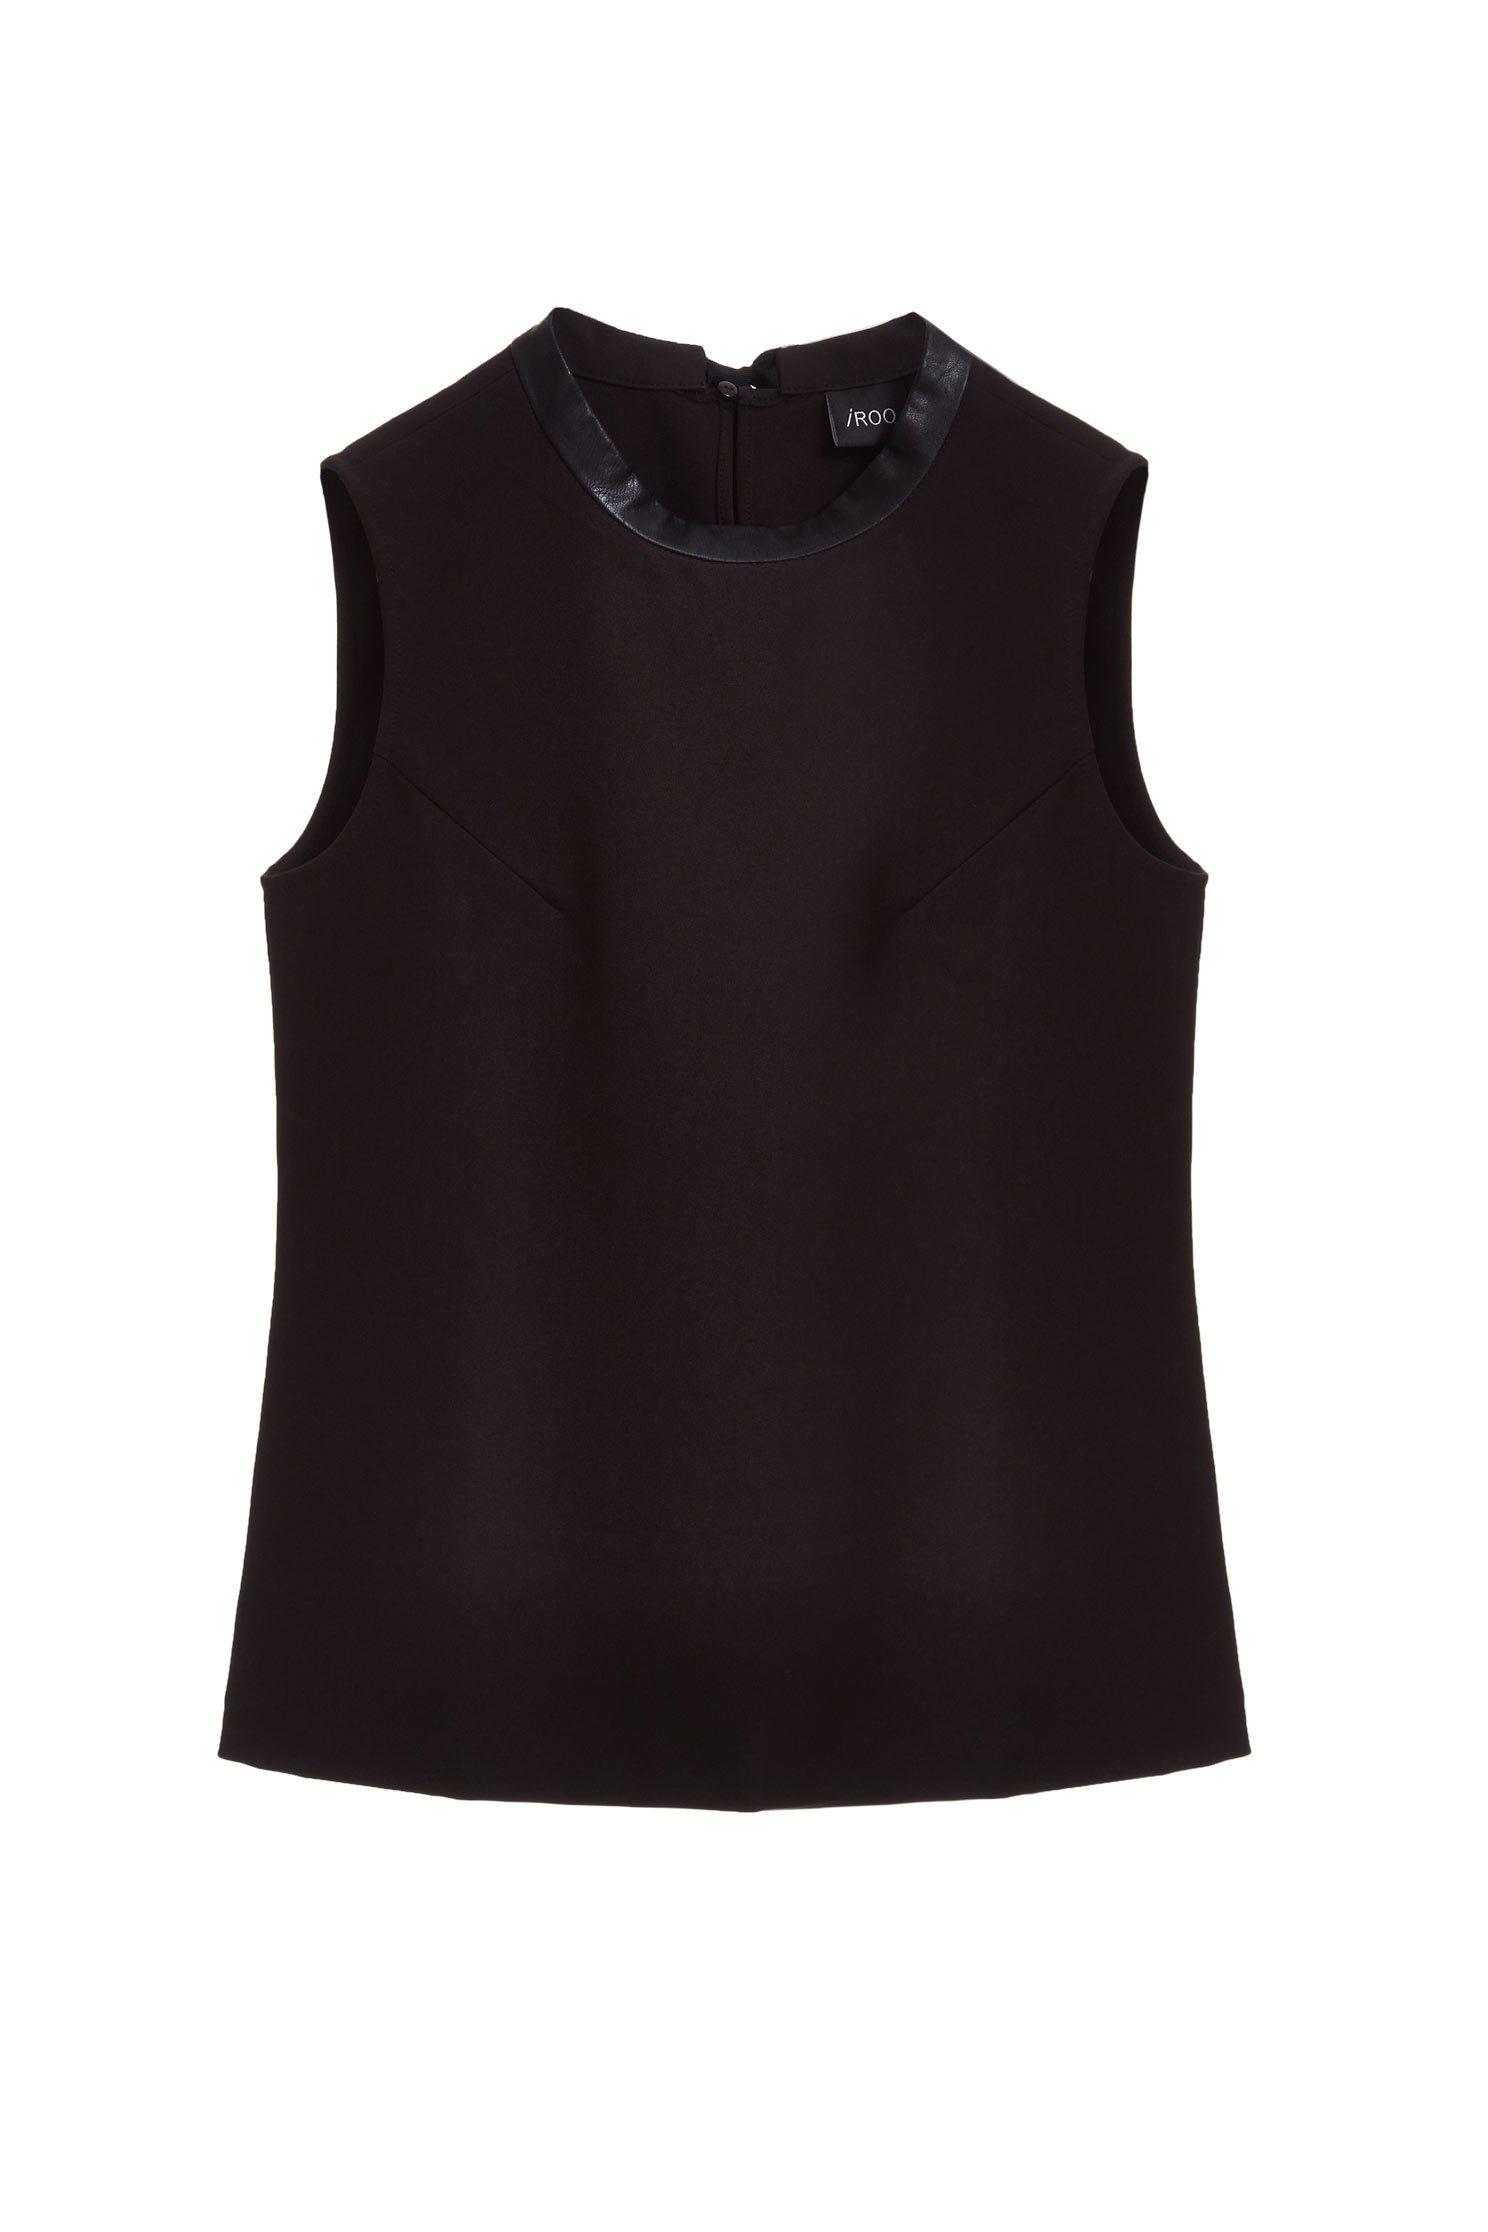 Classic fashion sleeveless vest